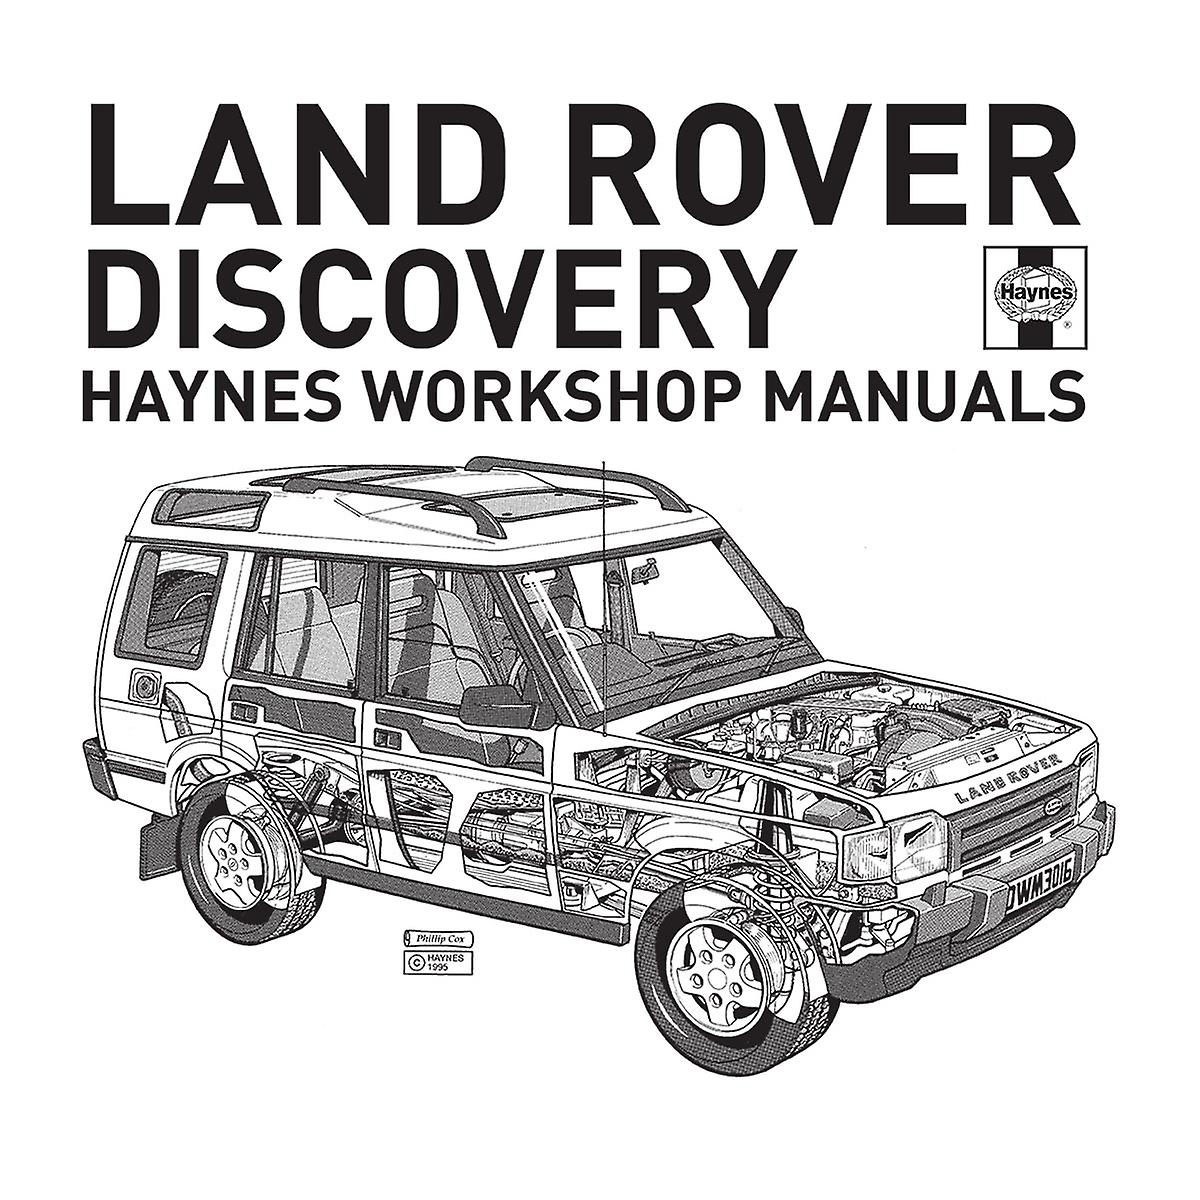 Haynes Workshop Manual Land Rover Discovery Black Kid